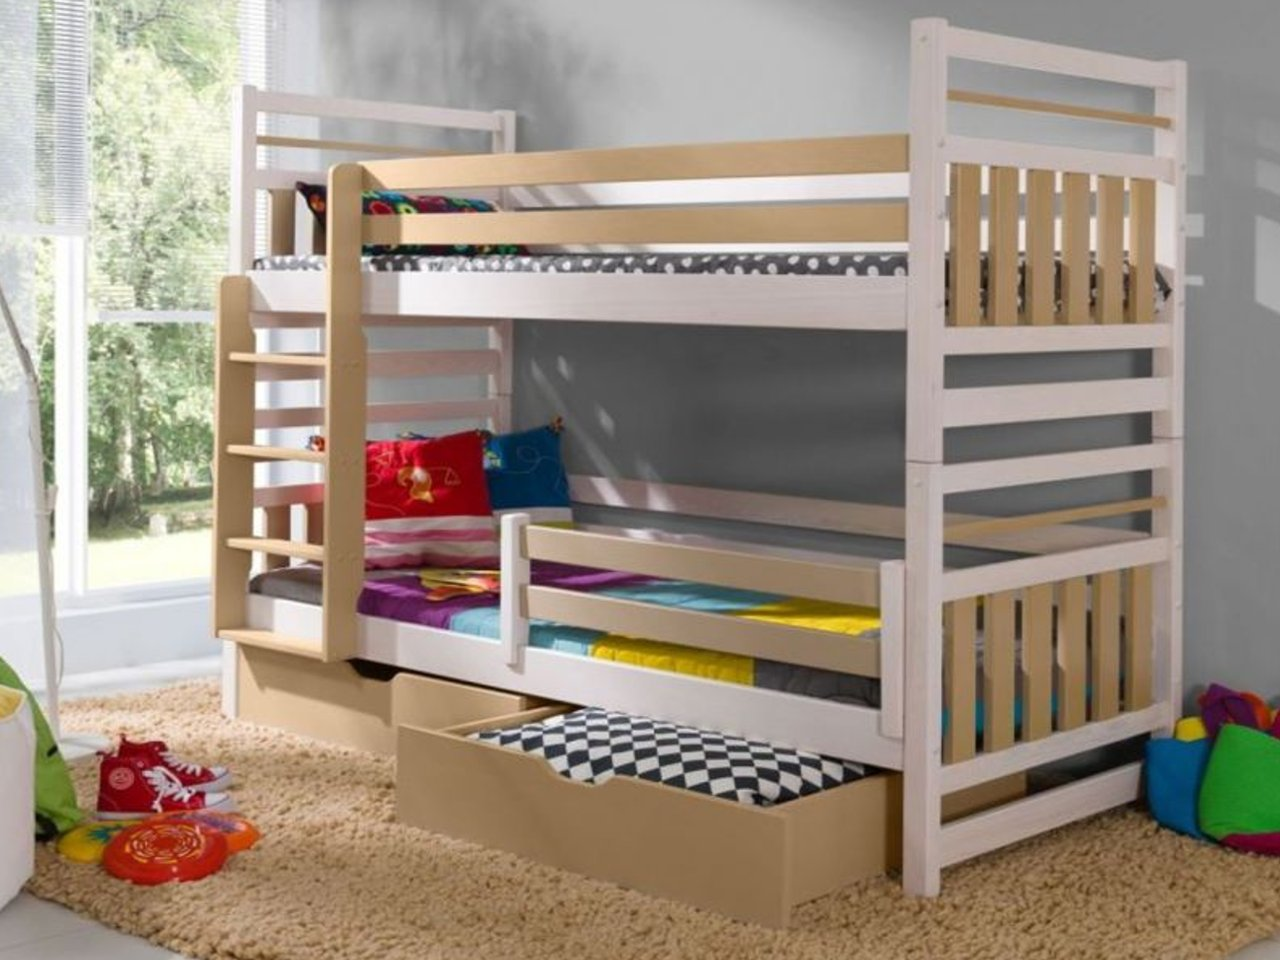 łóżko Piętrowe Drewniane Z Drabinką Miromir Hit 7256103562